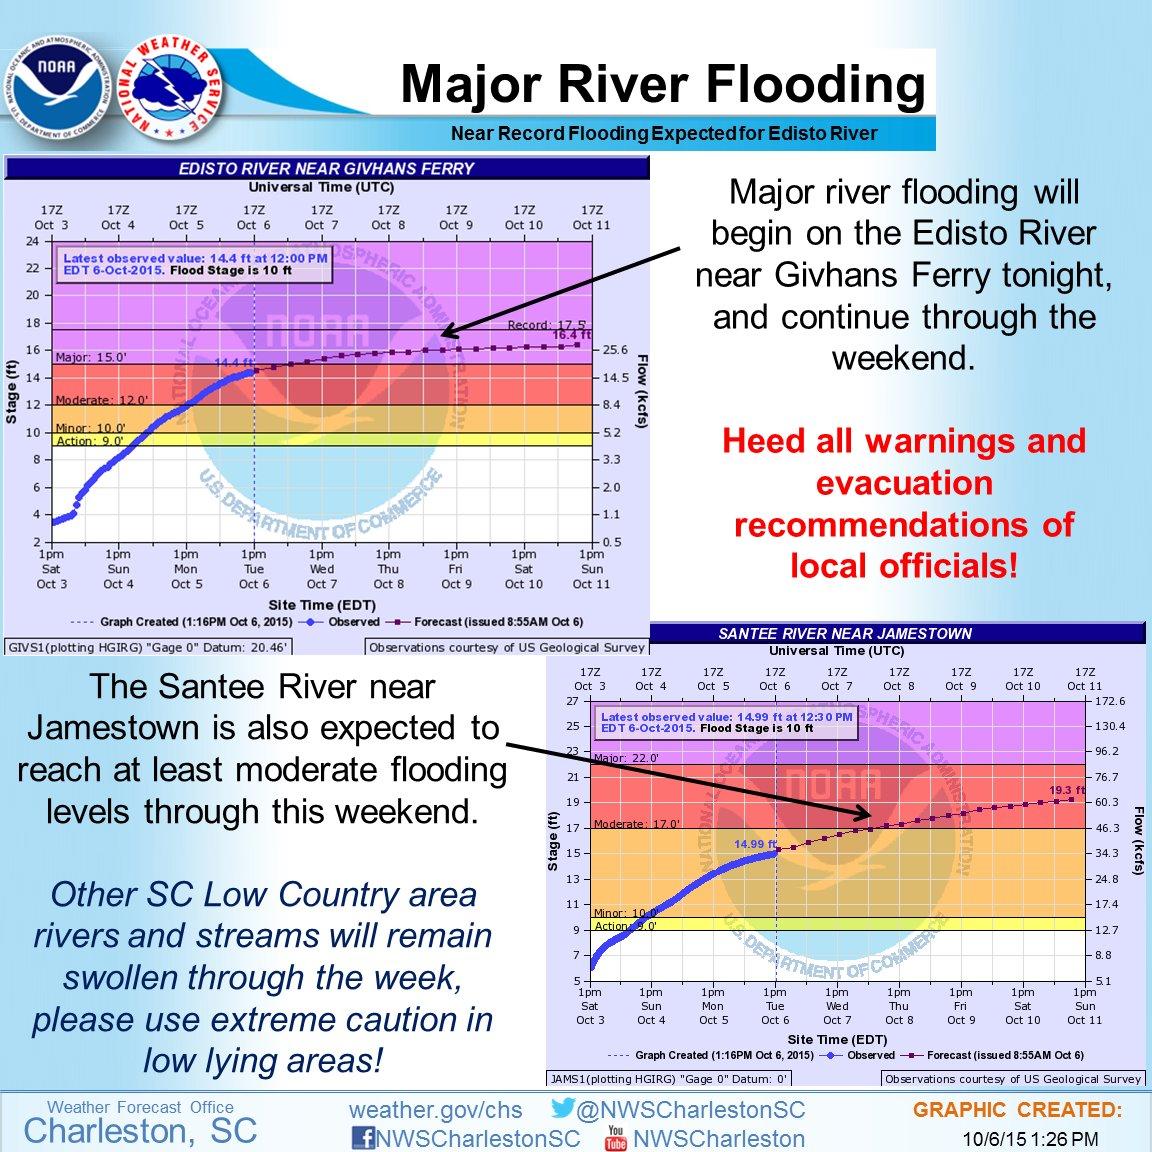 South Carolina Flooding Danger Remains as Historic Rainfall Passes